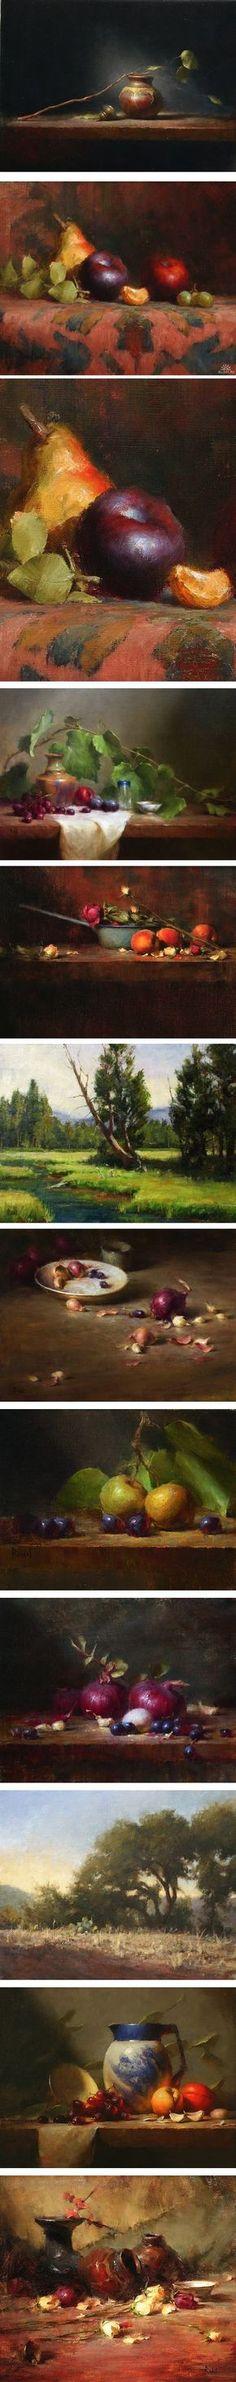 Davie Reidel, still life